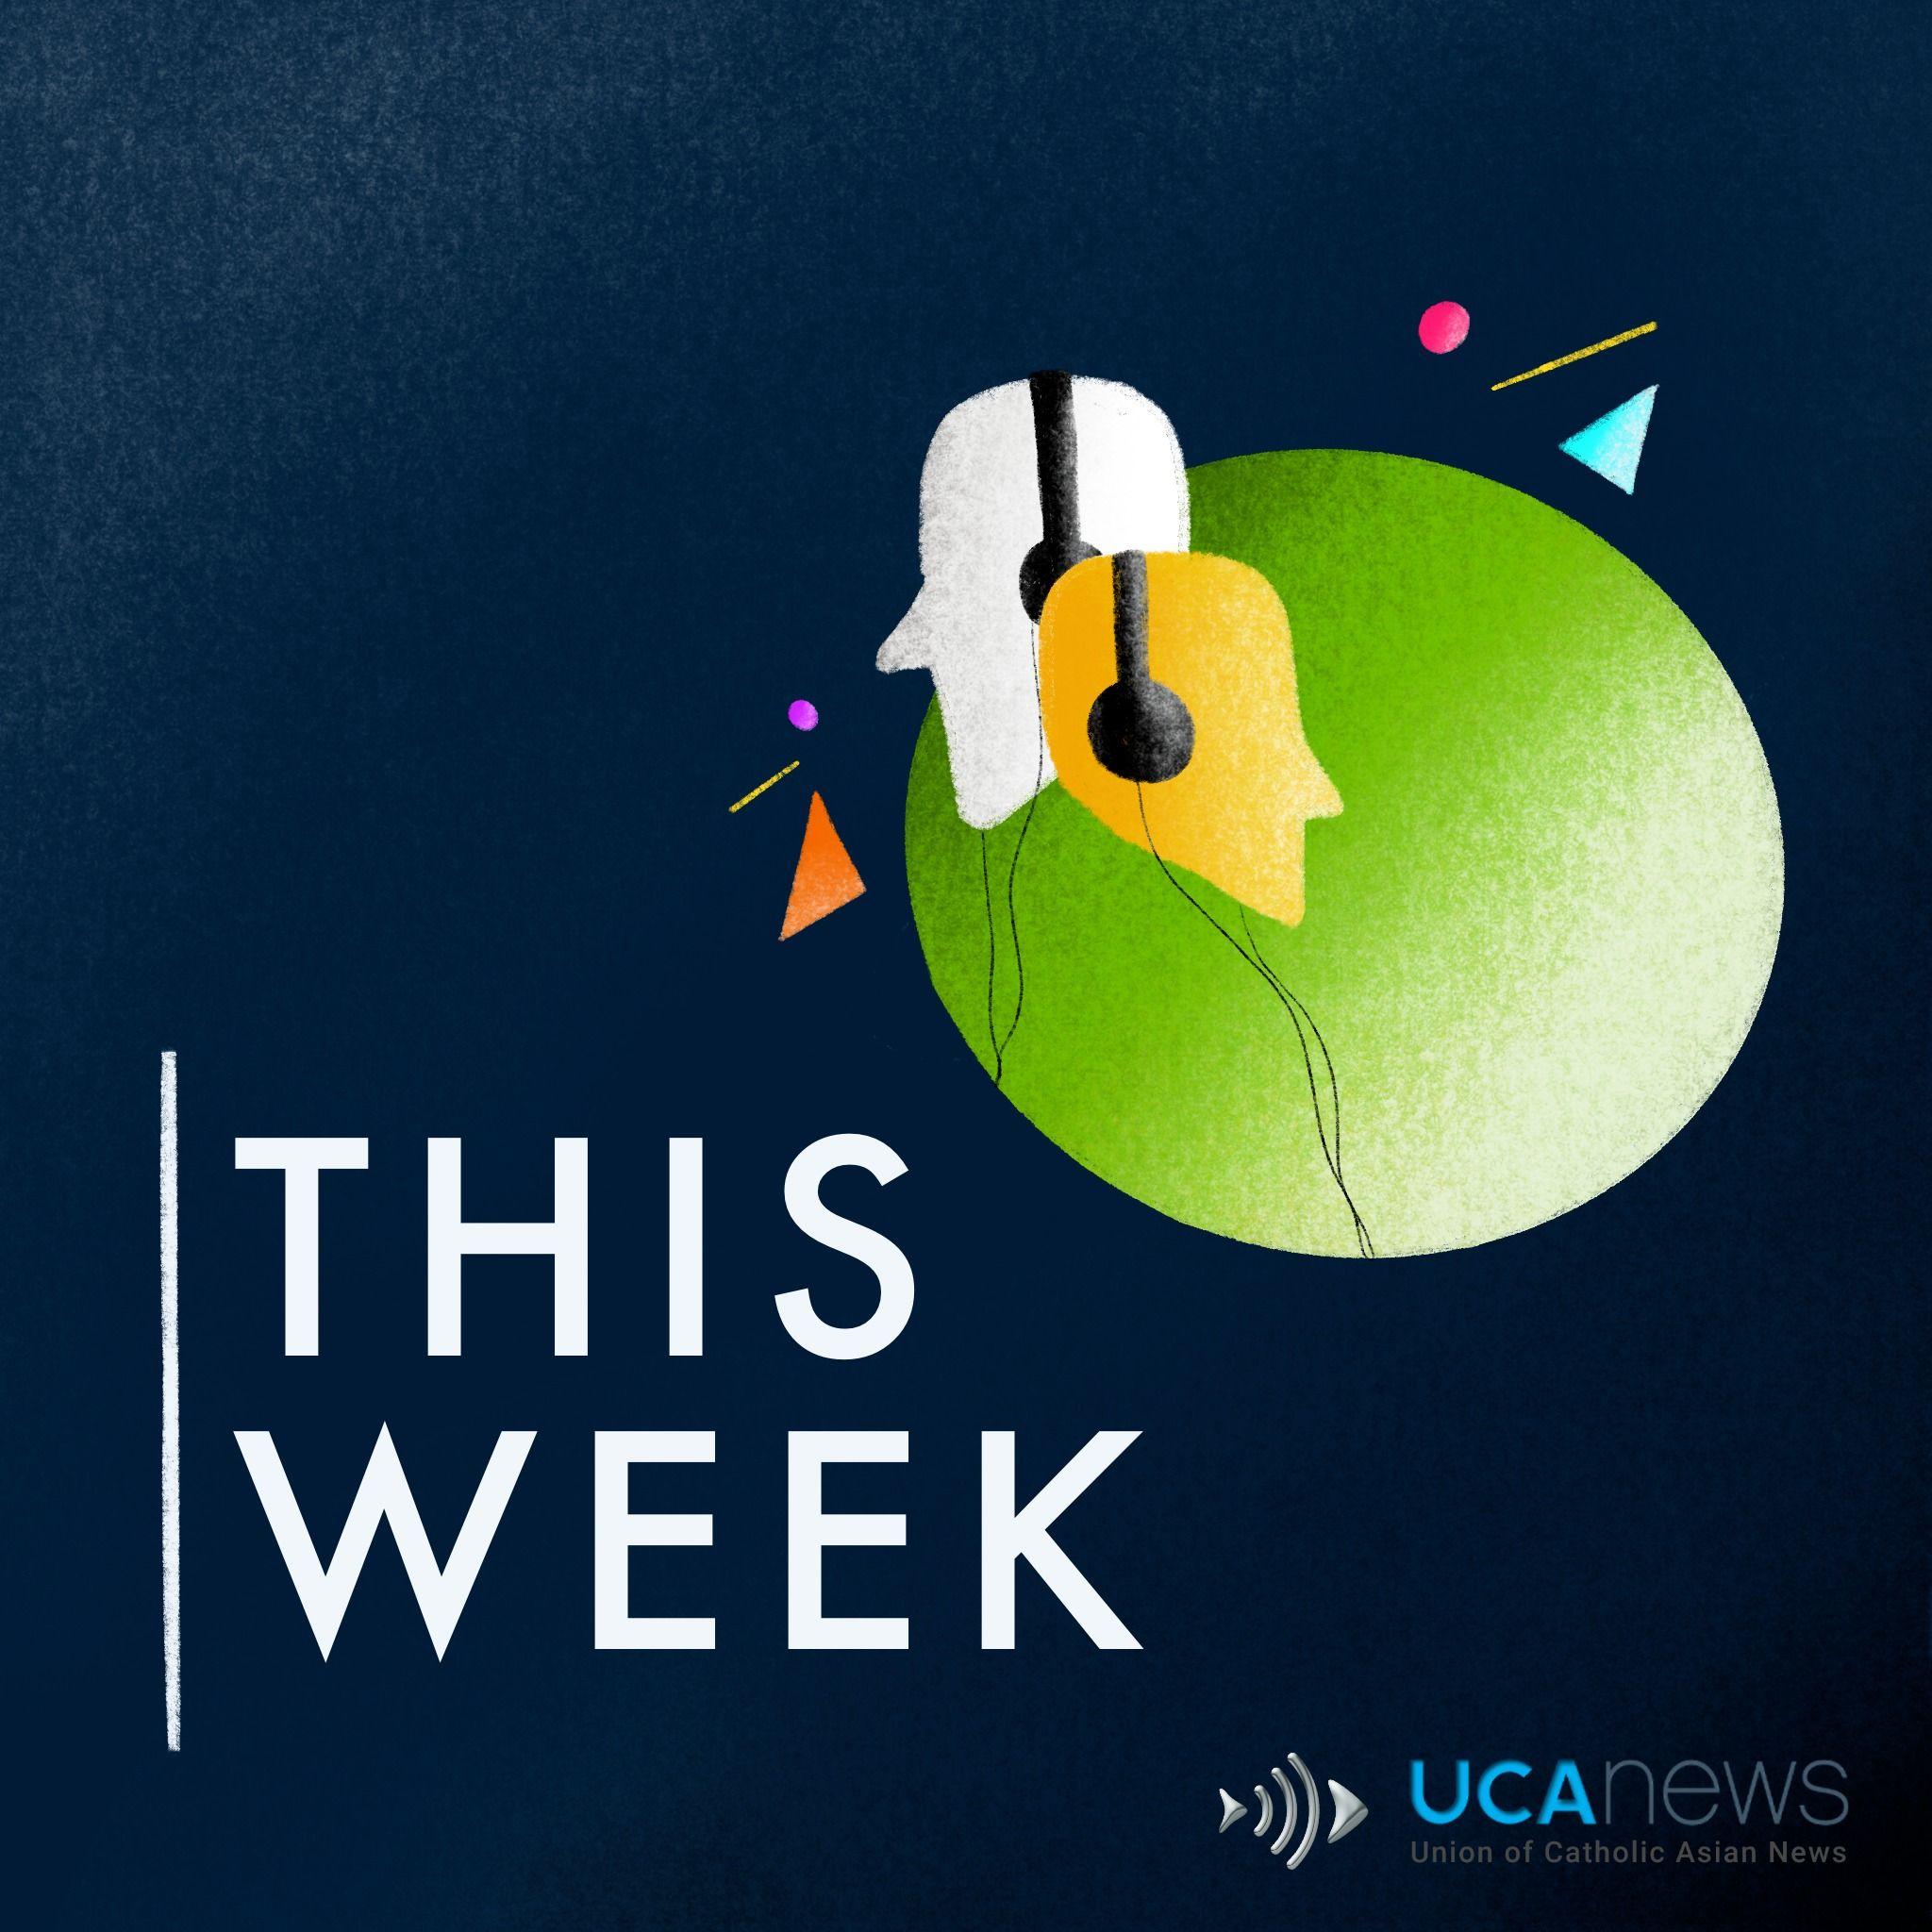 UCA News Weekly Summary, June 11, 2021